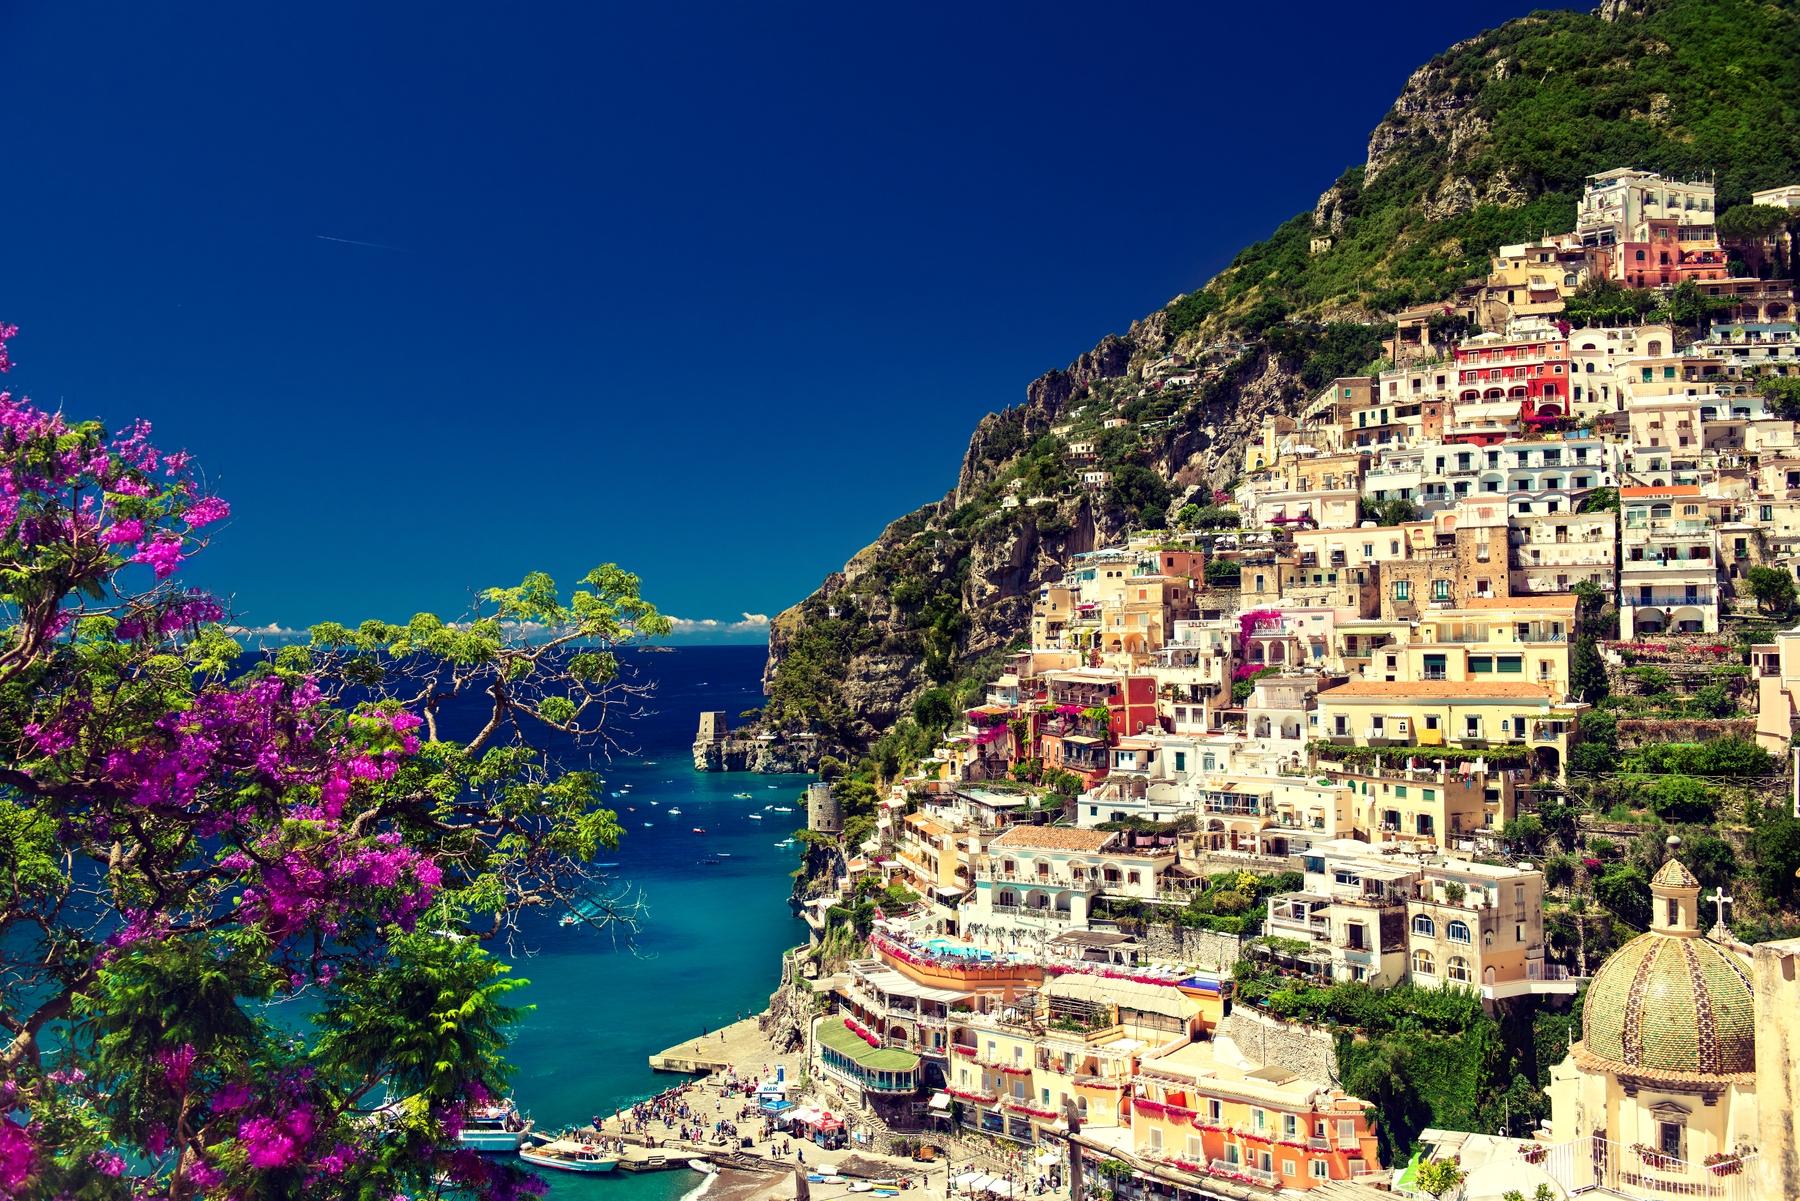 Traumurlaub an der Amalfi Küste